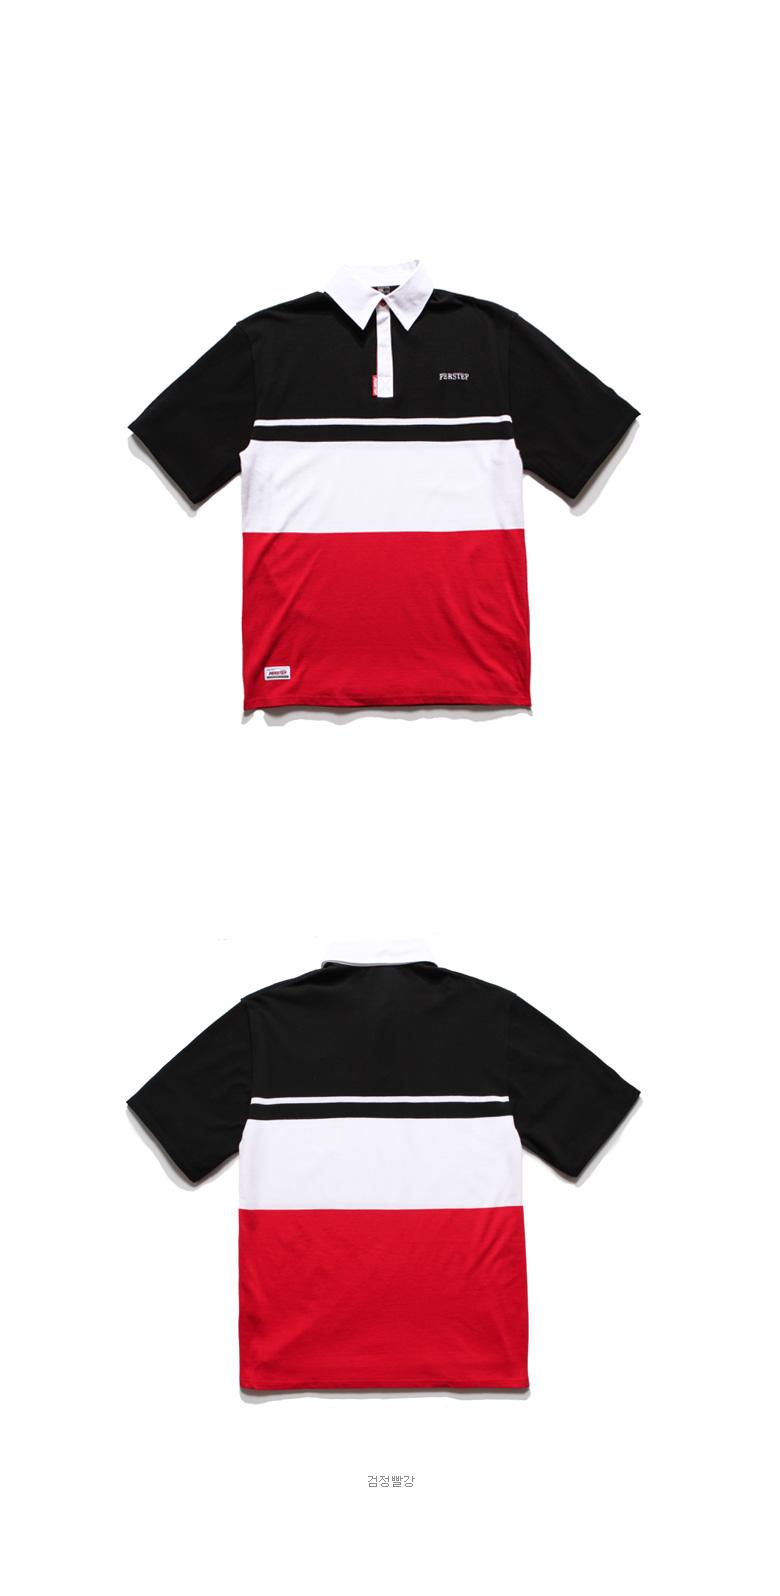 20180509_ps_boatcollar_tshirt_blackred_uk_01.jpg